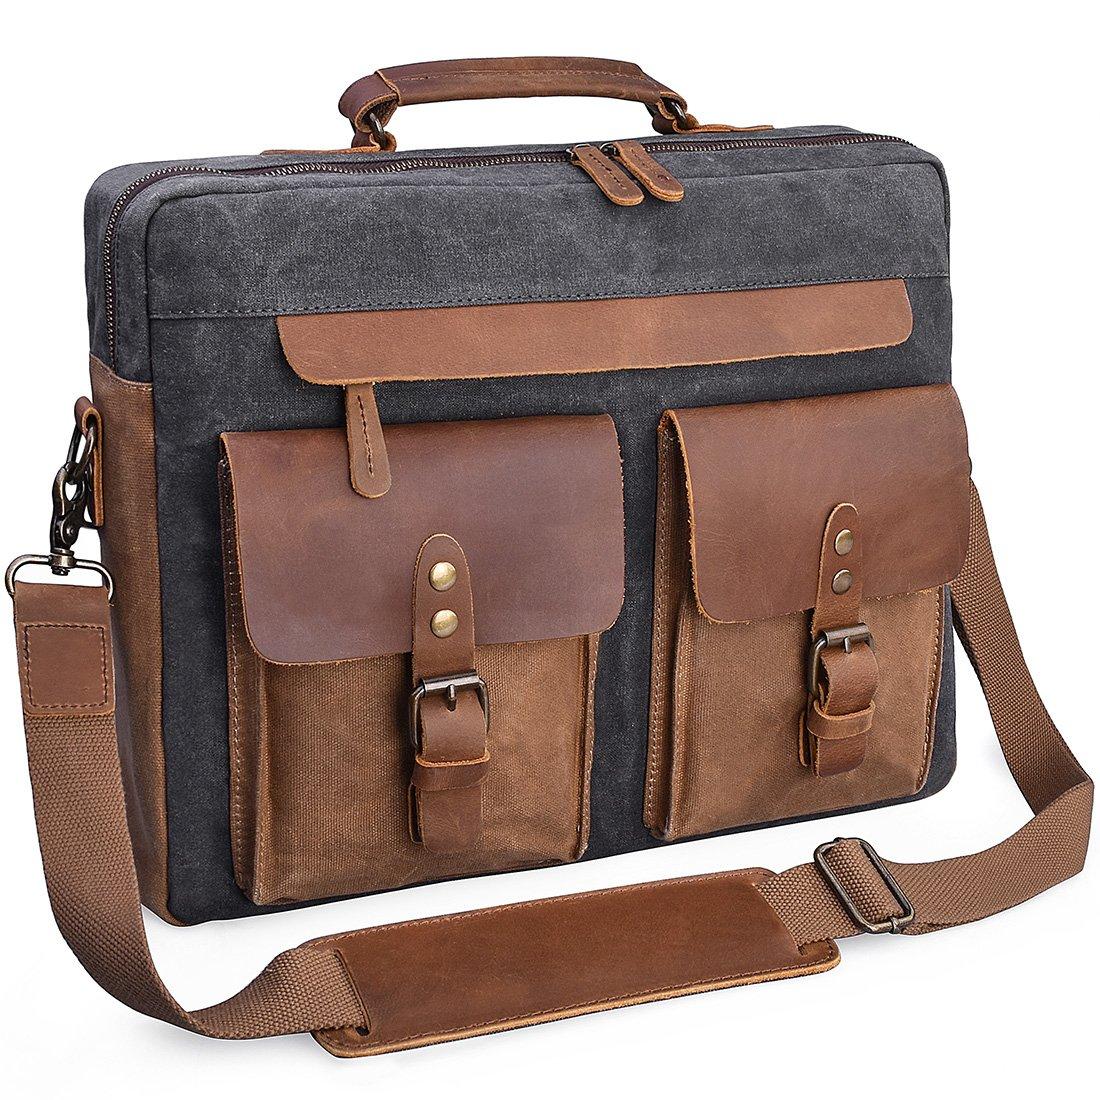 702ce727e7 Amazon.com  Mens Messenger Bag 15.6 Inch Vintage Genuine Leather Briefcase  Waterproof Waxed Canvas Laptop Computer Bag Large Leather Satchel Shoulder  Bag ...